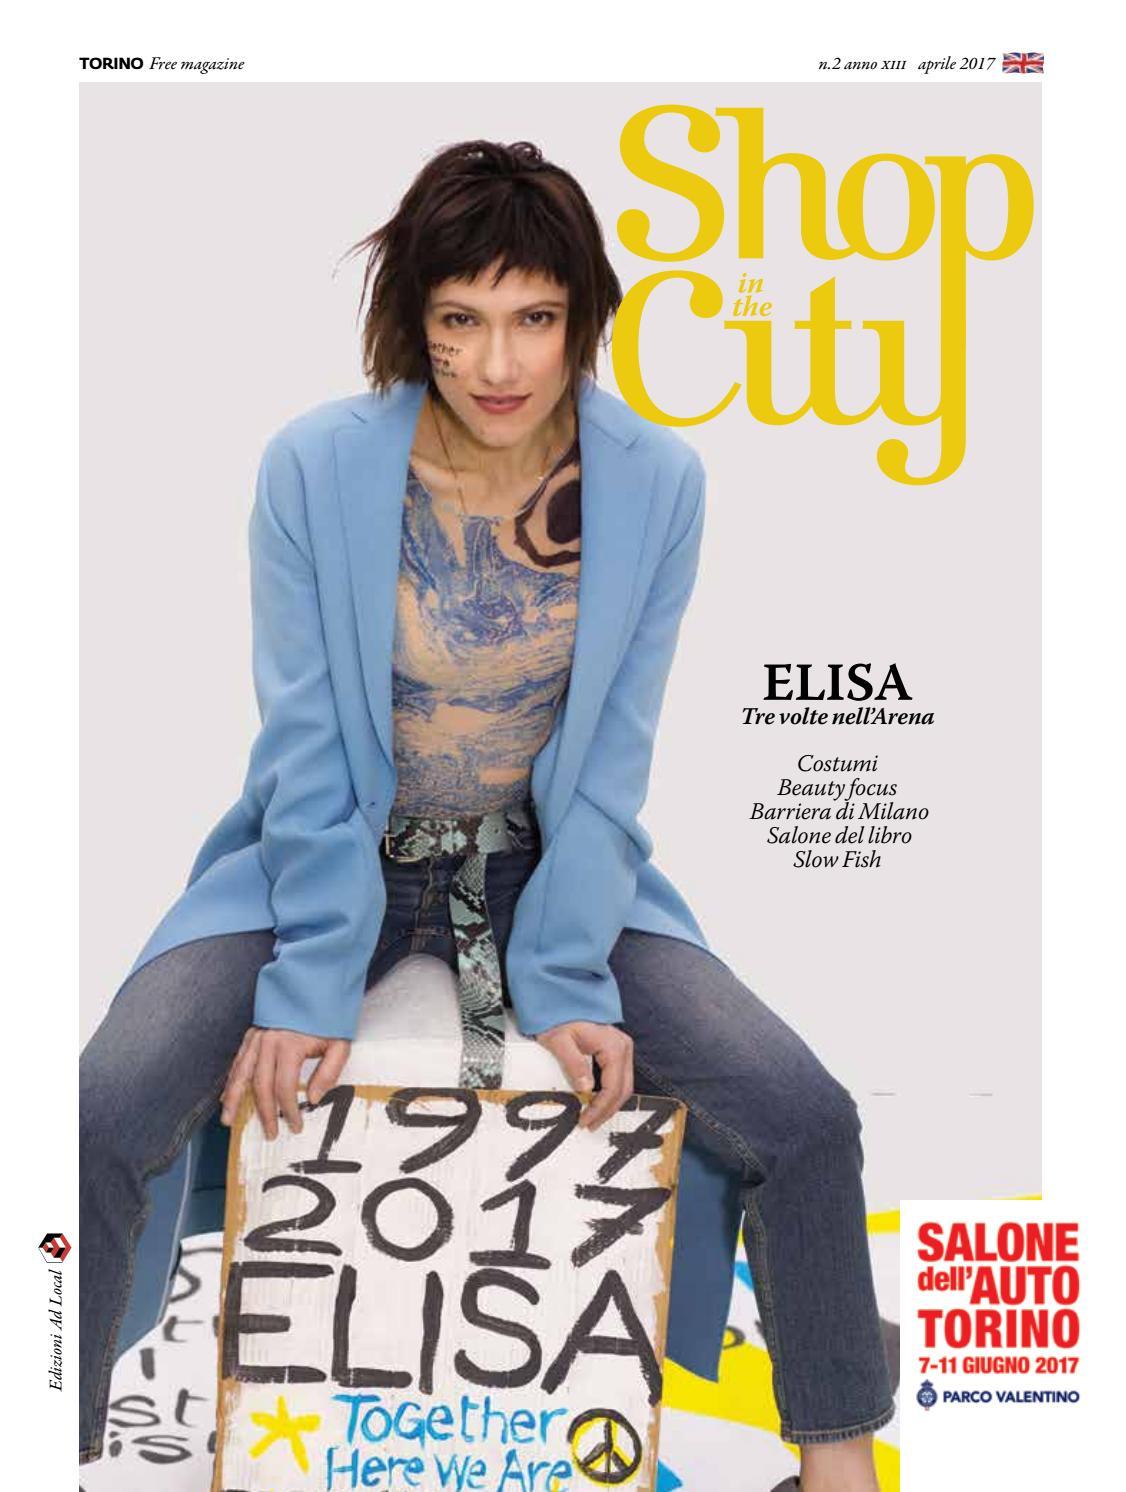 c45d163188c Shopinthecity Torino aprile2017 by ShopintheCity - issuu